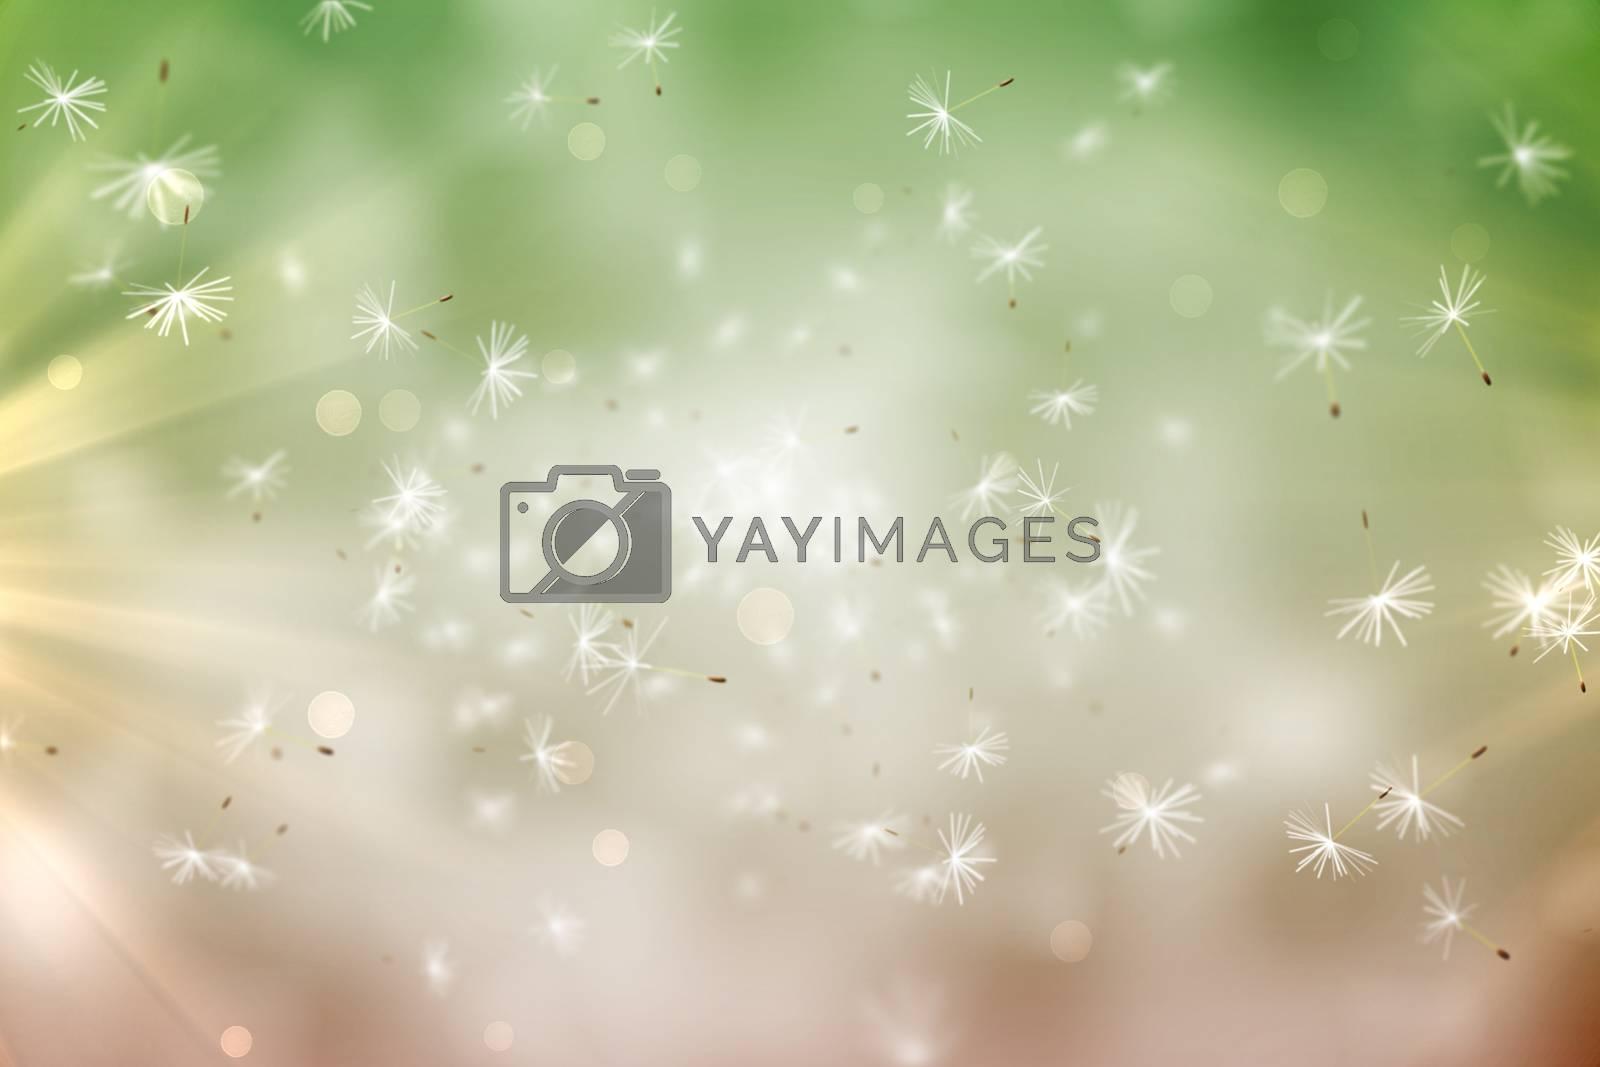 Royalty free image of Digitally generated dandelion seeds on green background by Wavebreakmedia